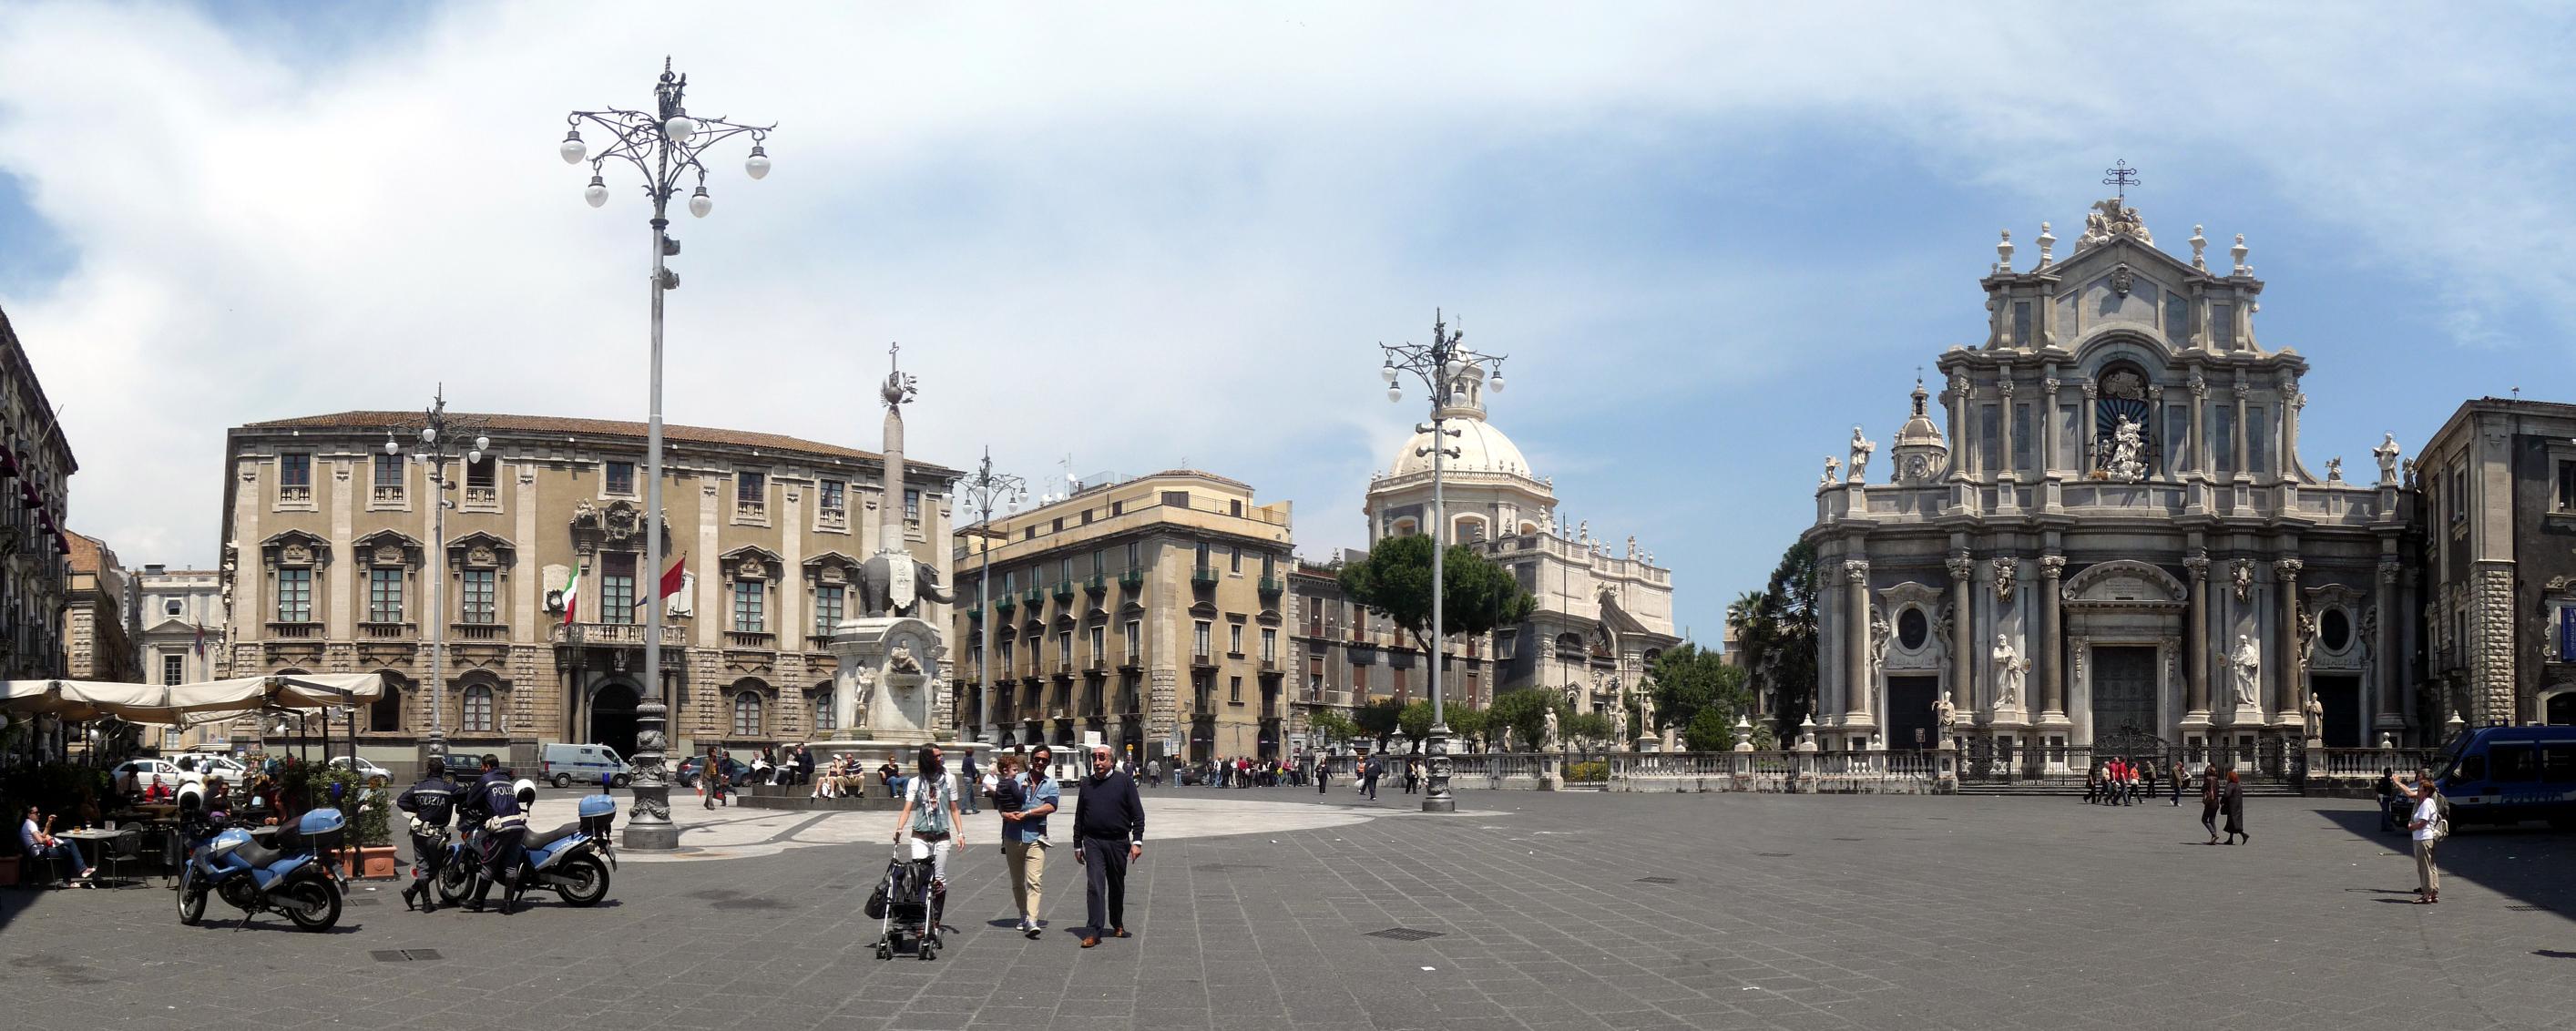 File:Piazza del Duomo, Catania, Panorama.jpg - Wikimedia ...